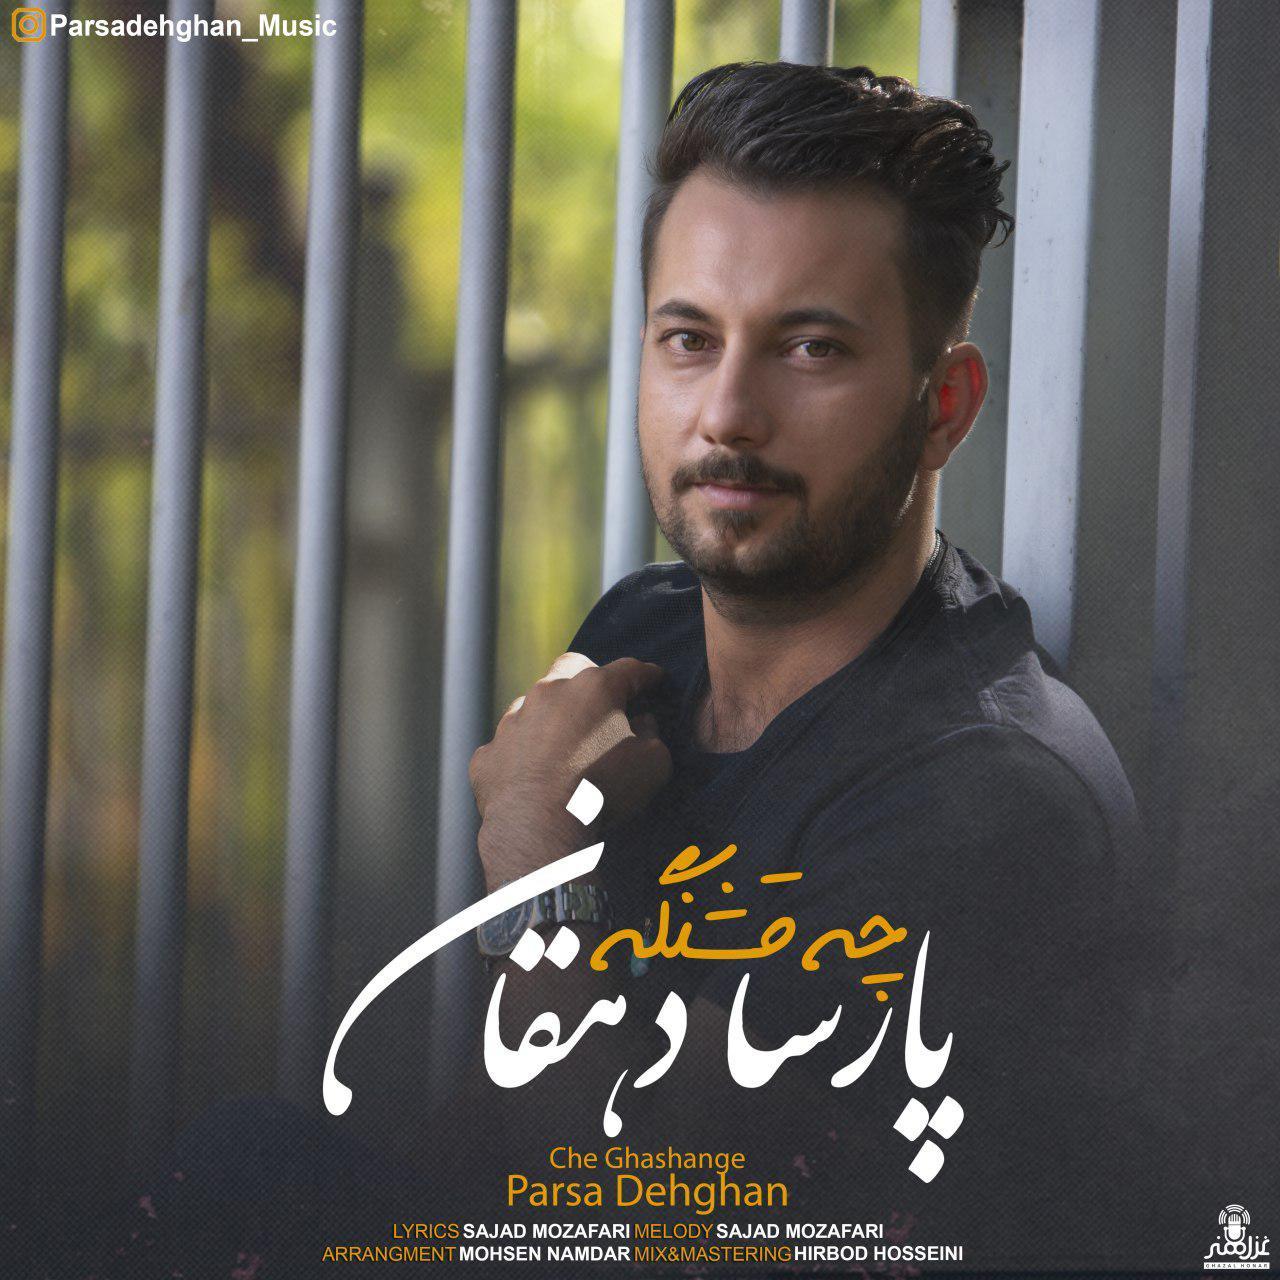 Parsa Dehghan – Che Ghashange